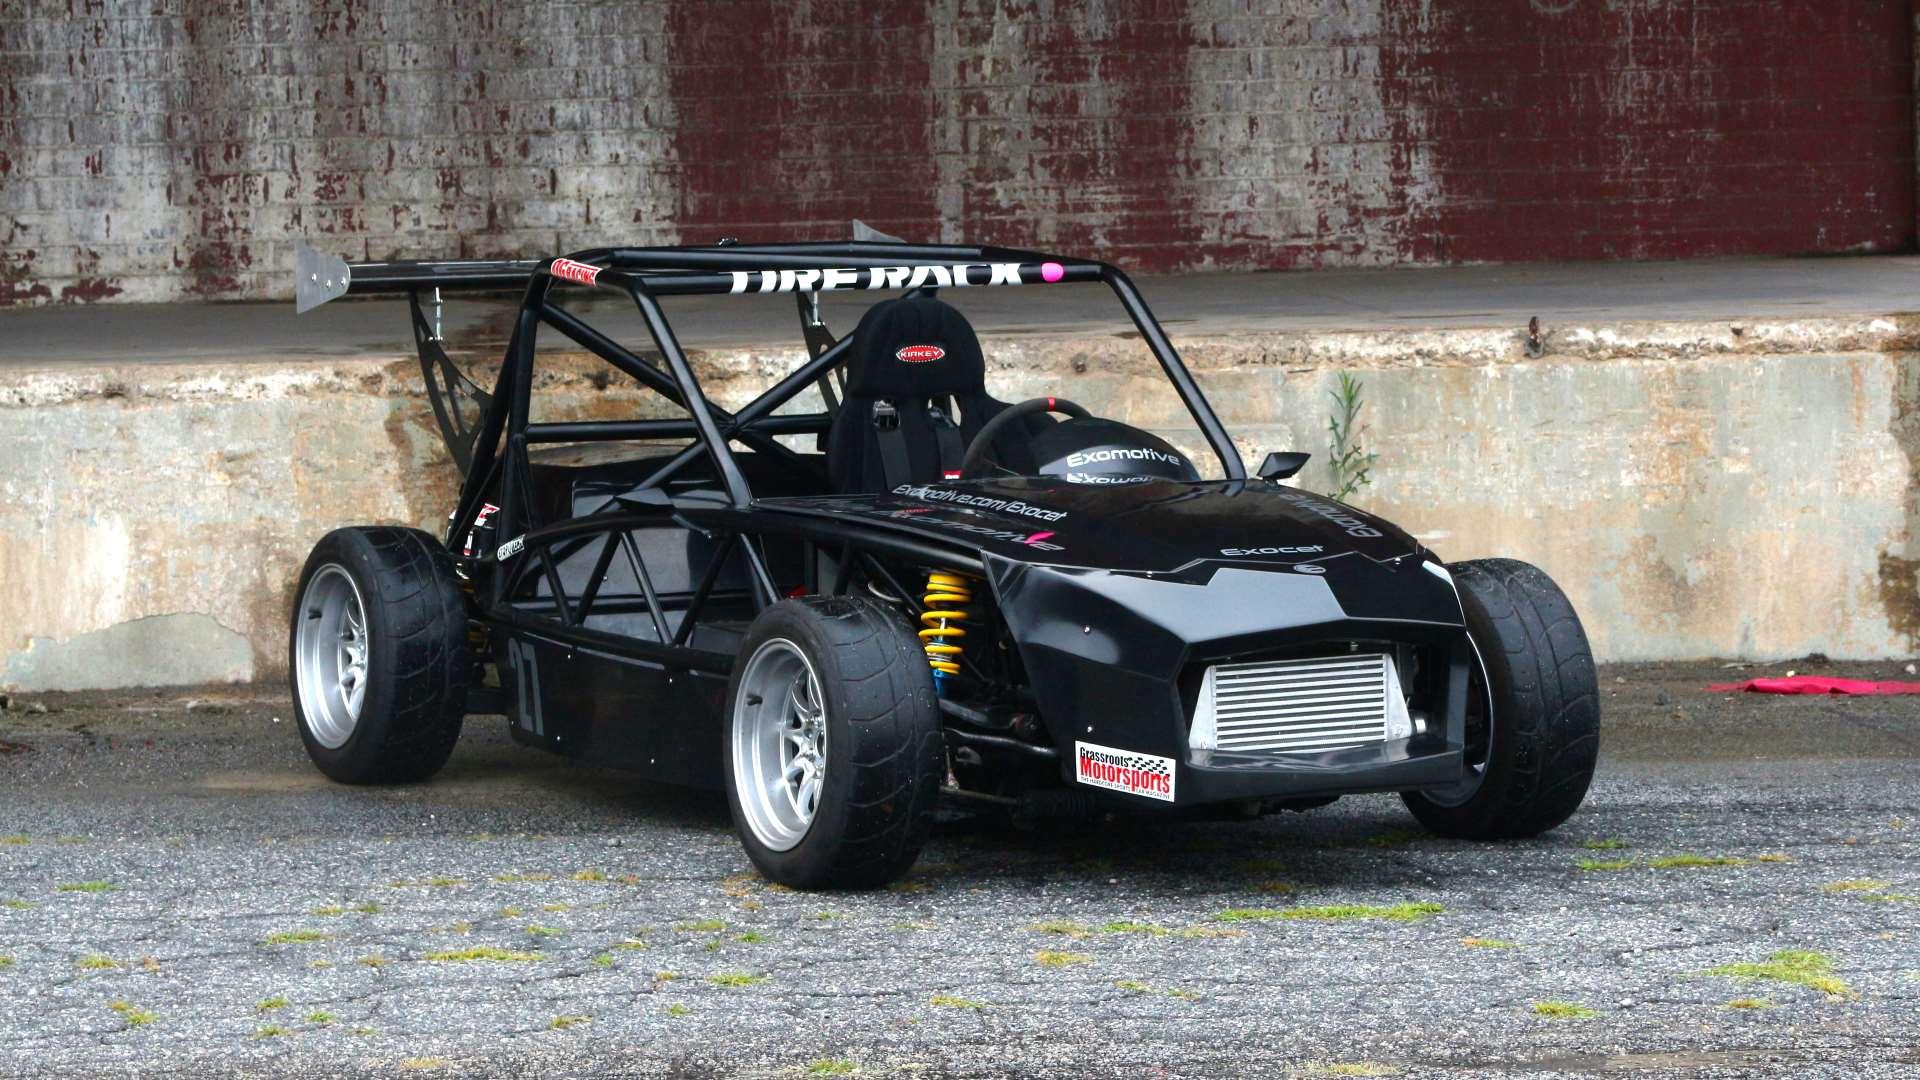 Exomotive Exocet Kit Cars | ToysForBigBoys.com